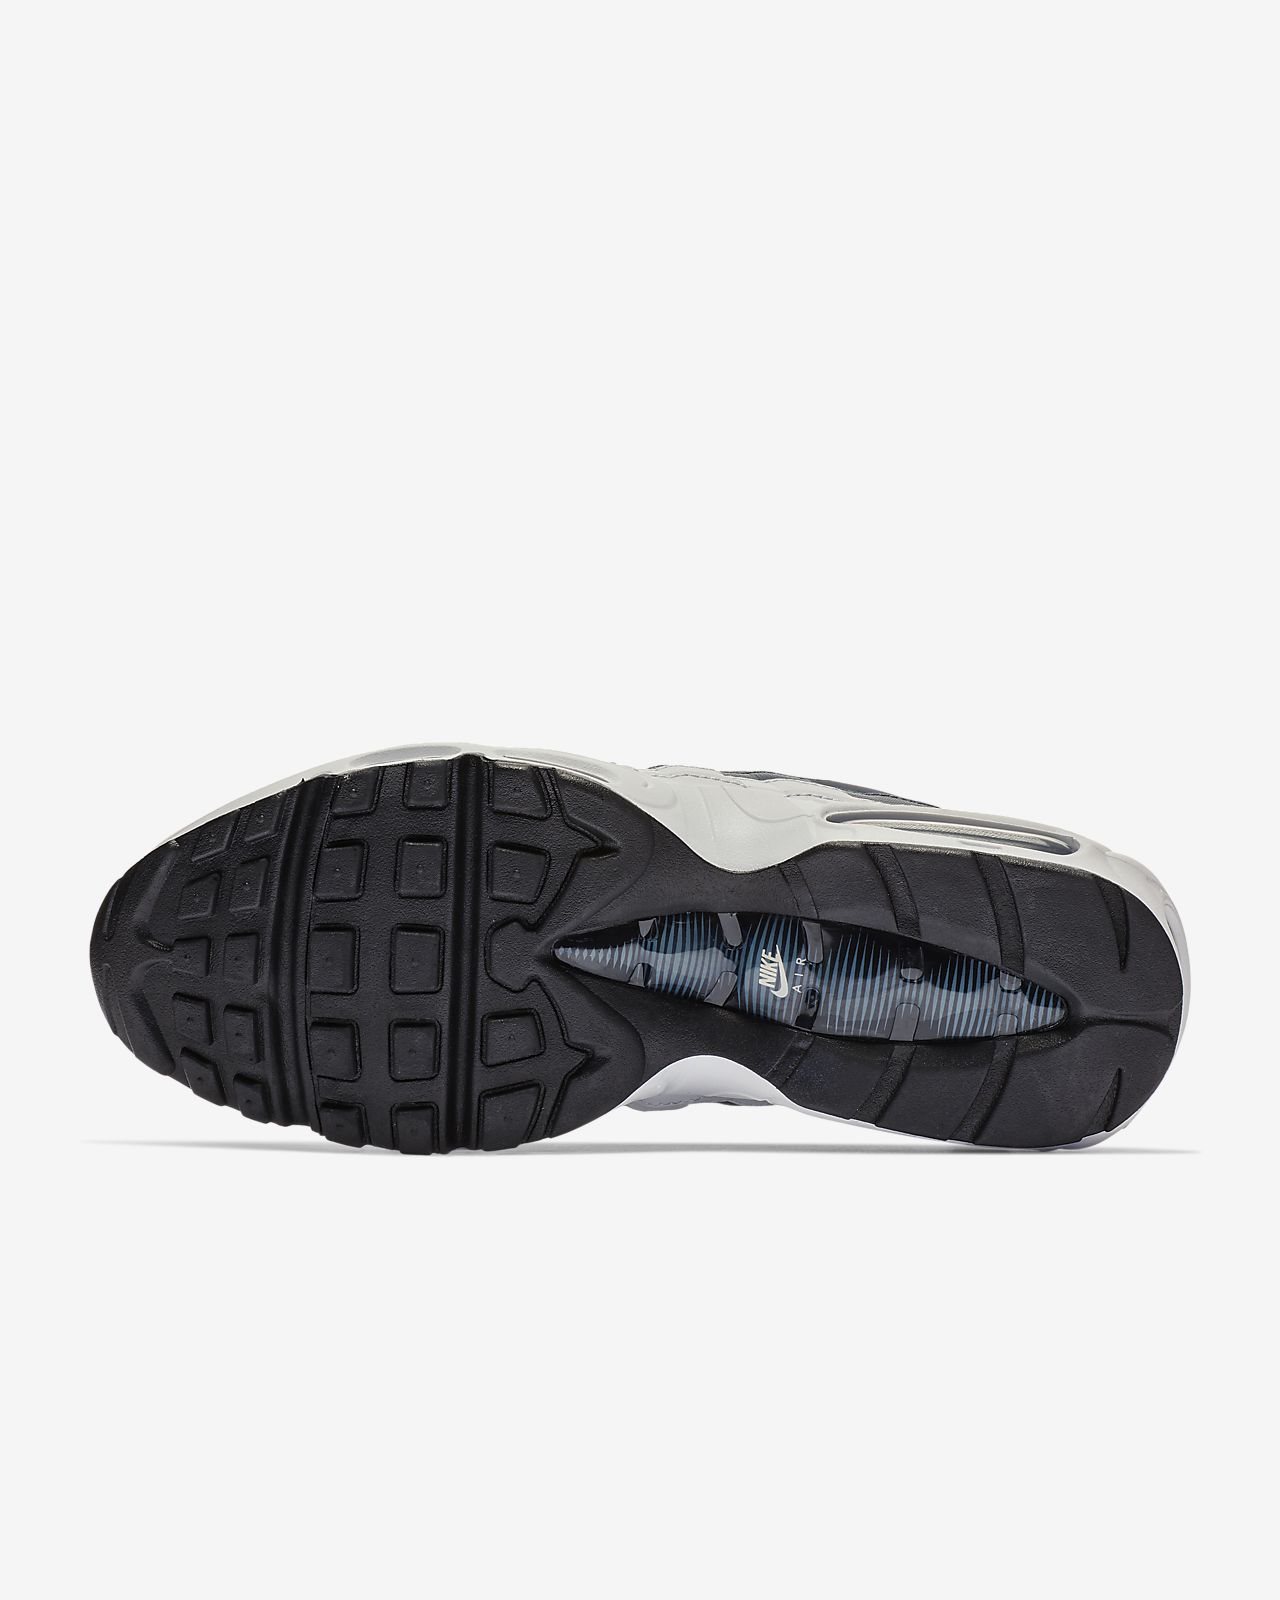 online retailer 8da82 94cc6 ... Nike Air Max 95 Essential Men s Shoe